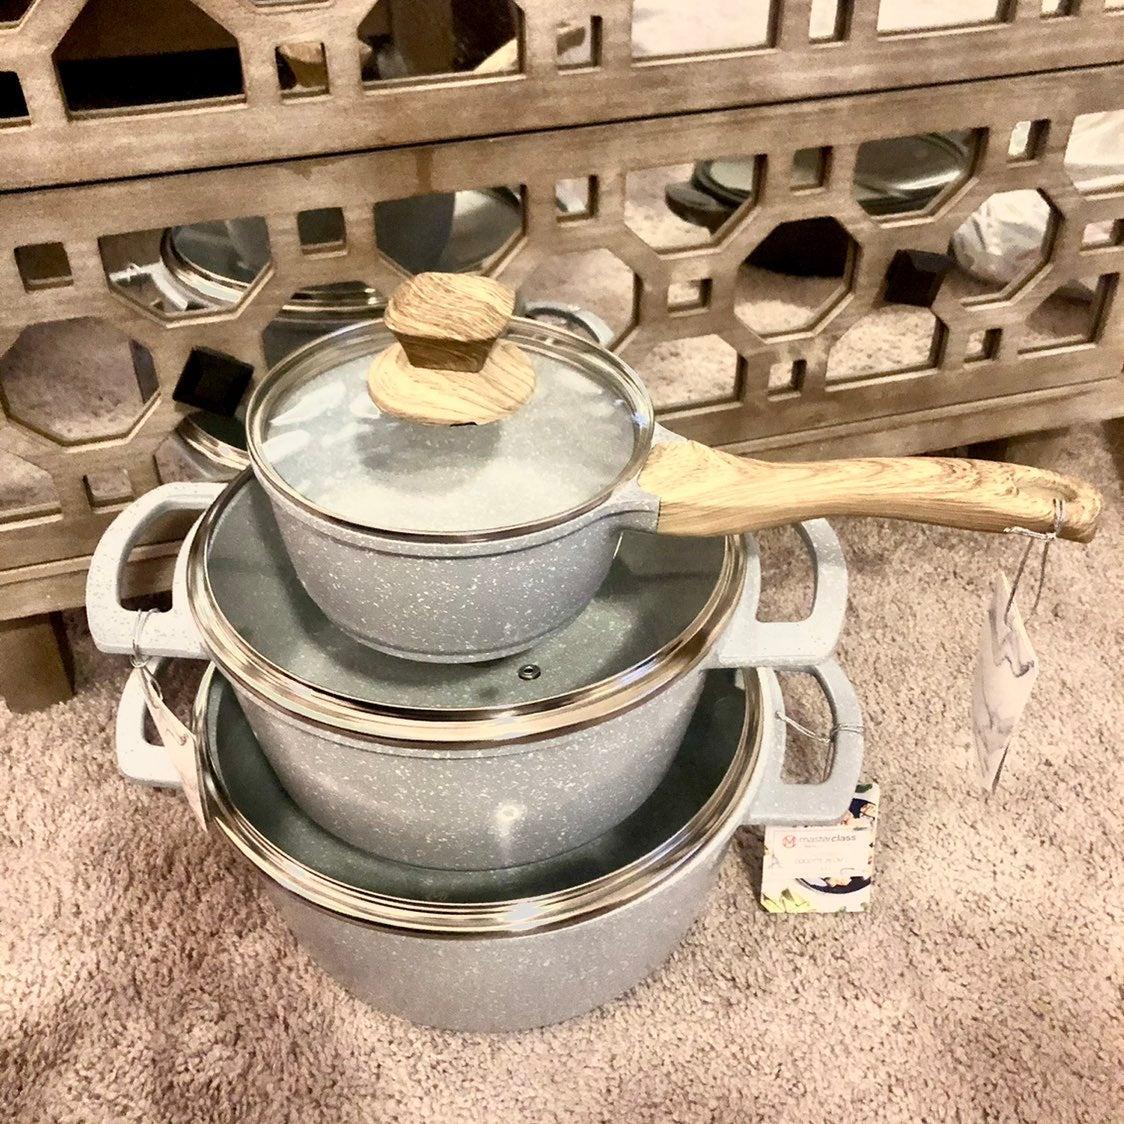 6 Piece Masterclass Premium Cookware